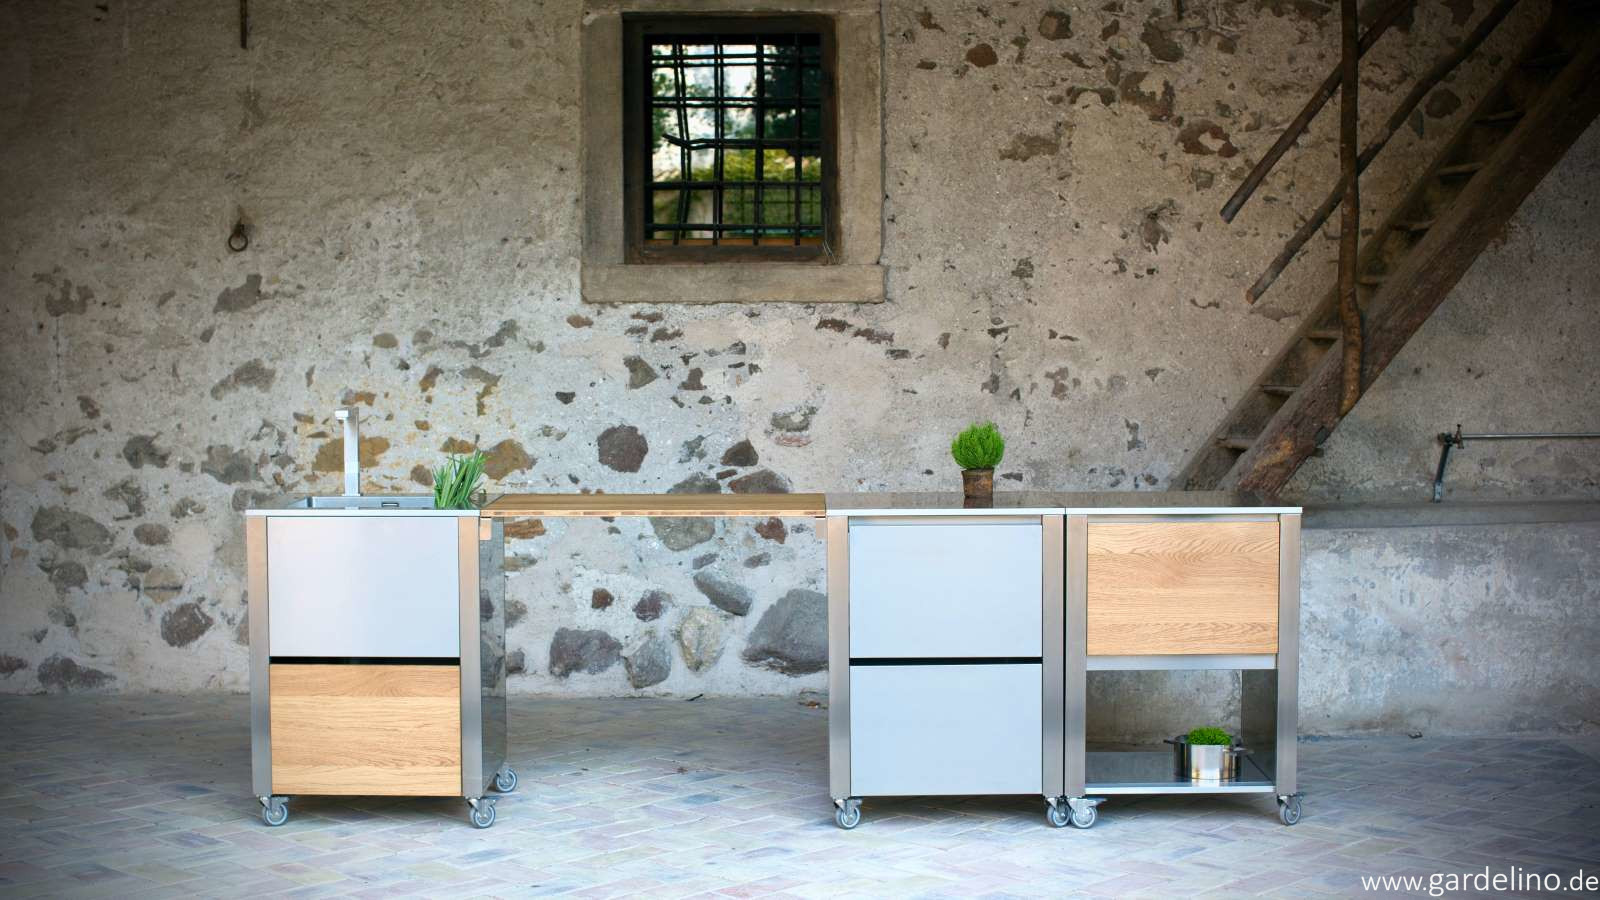 Outdoorküche Garten Edelstahl Kosten : Mobile outdoorküche cun von jokodomus system outdoorküche